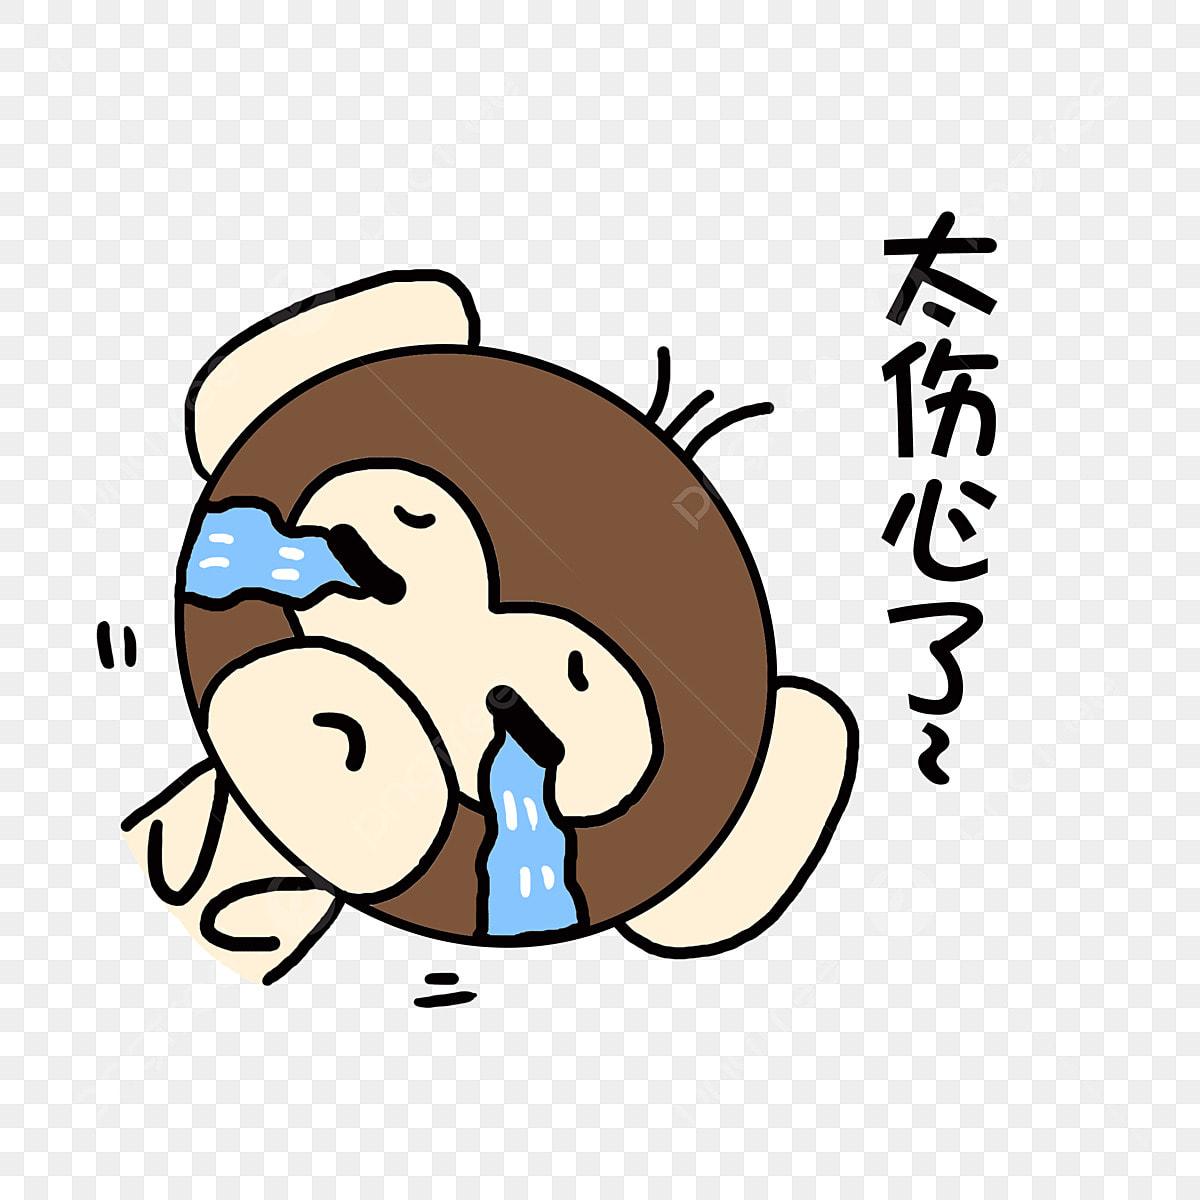 Animal Dibujado A Mano Lindo Mono Emoticon De Chat Mono